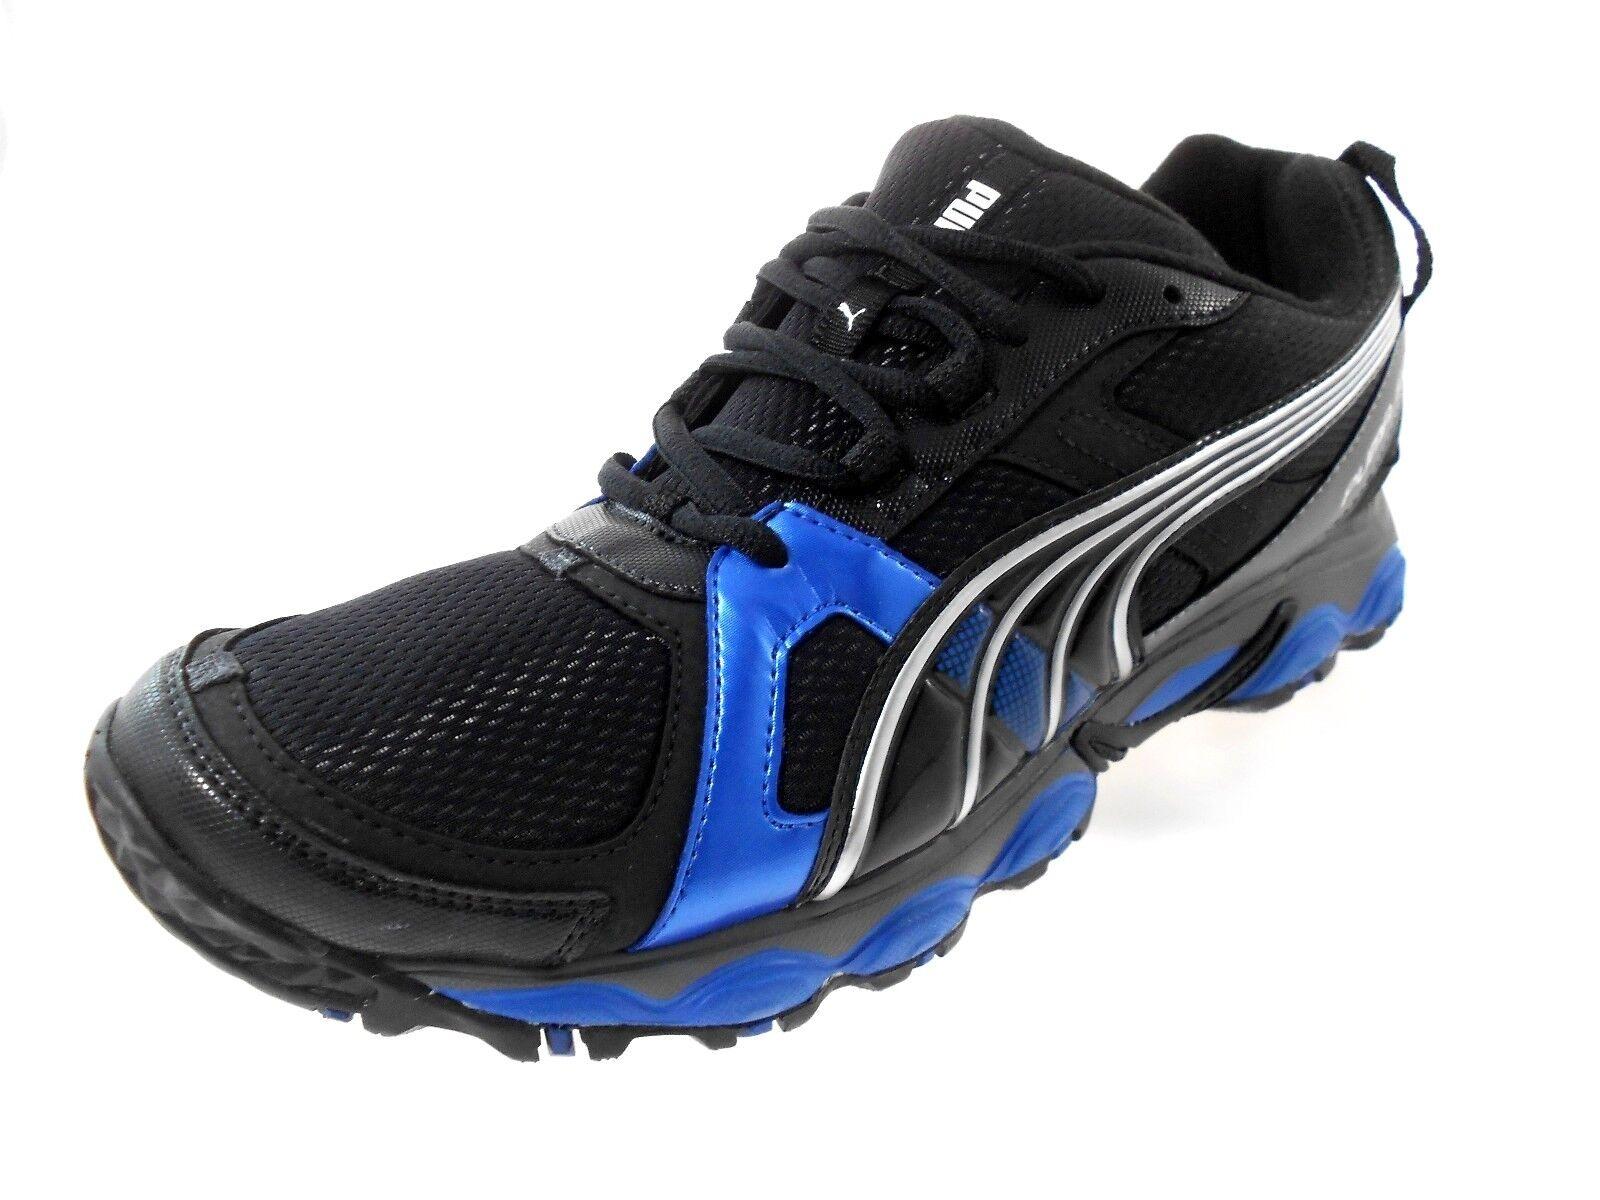 PUMA COMPLETE SLX RYJIN LT MEN'S BLACK/BLUE SHOES SIZE 10,  New shoes for men and women, limited time discount